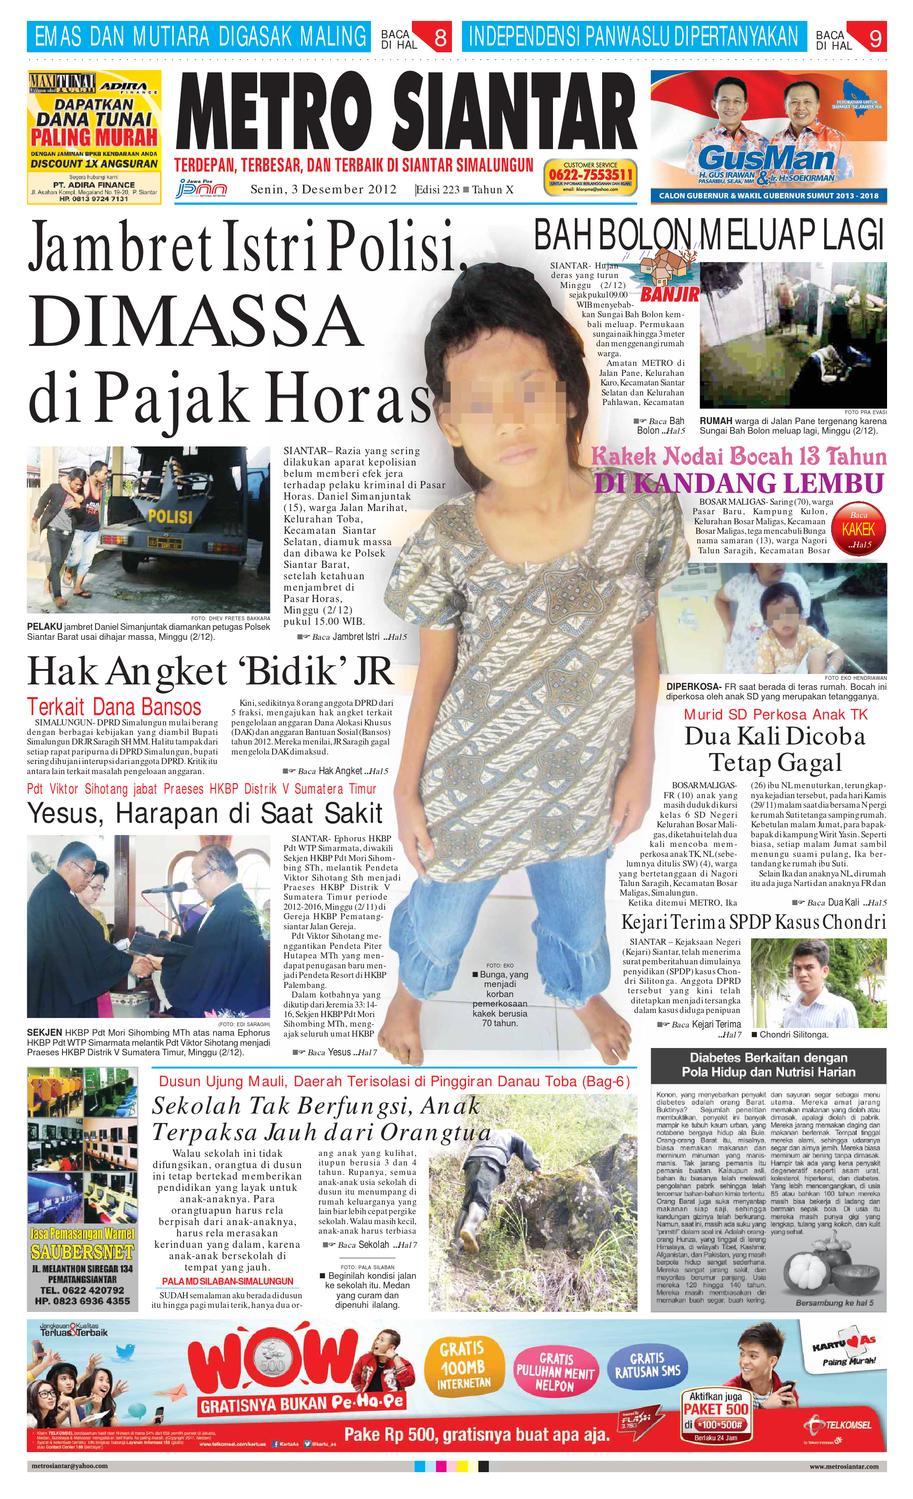 Epaper Metro Siantar By Issuu Produk Umkm Bumn Bolu Gulung Hj Enong